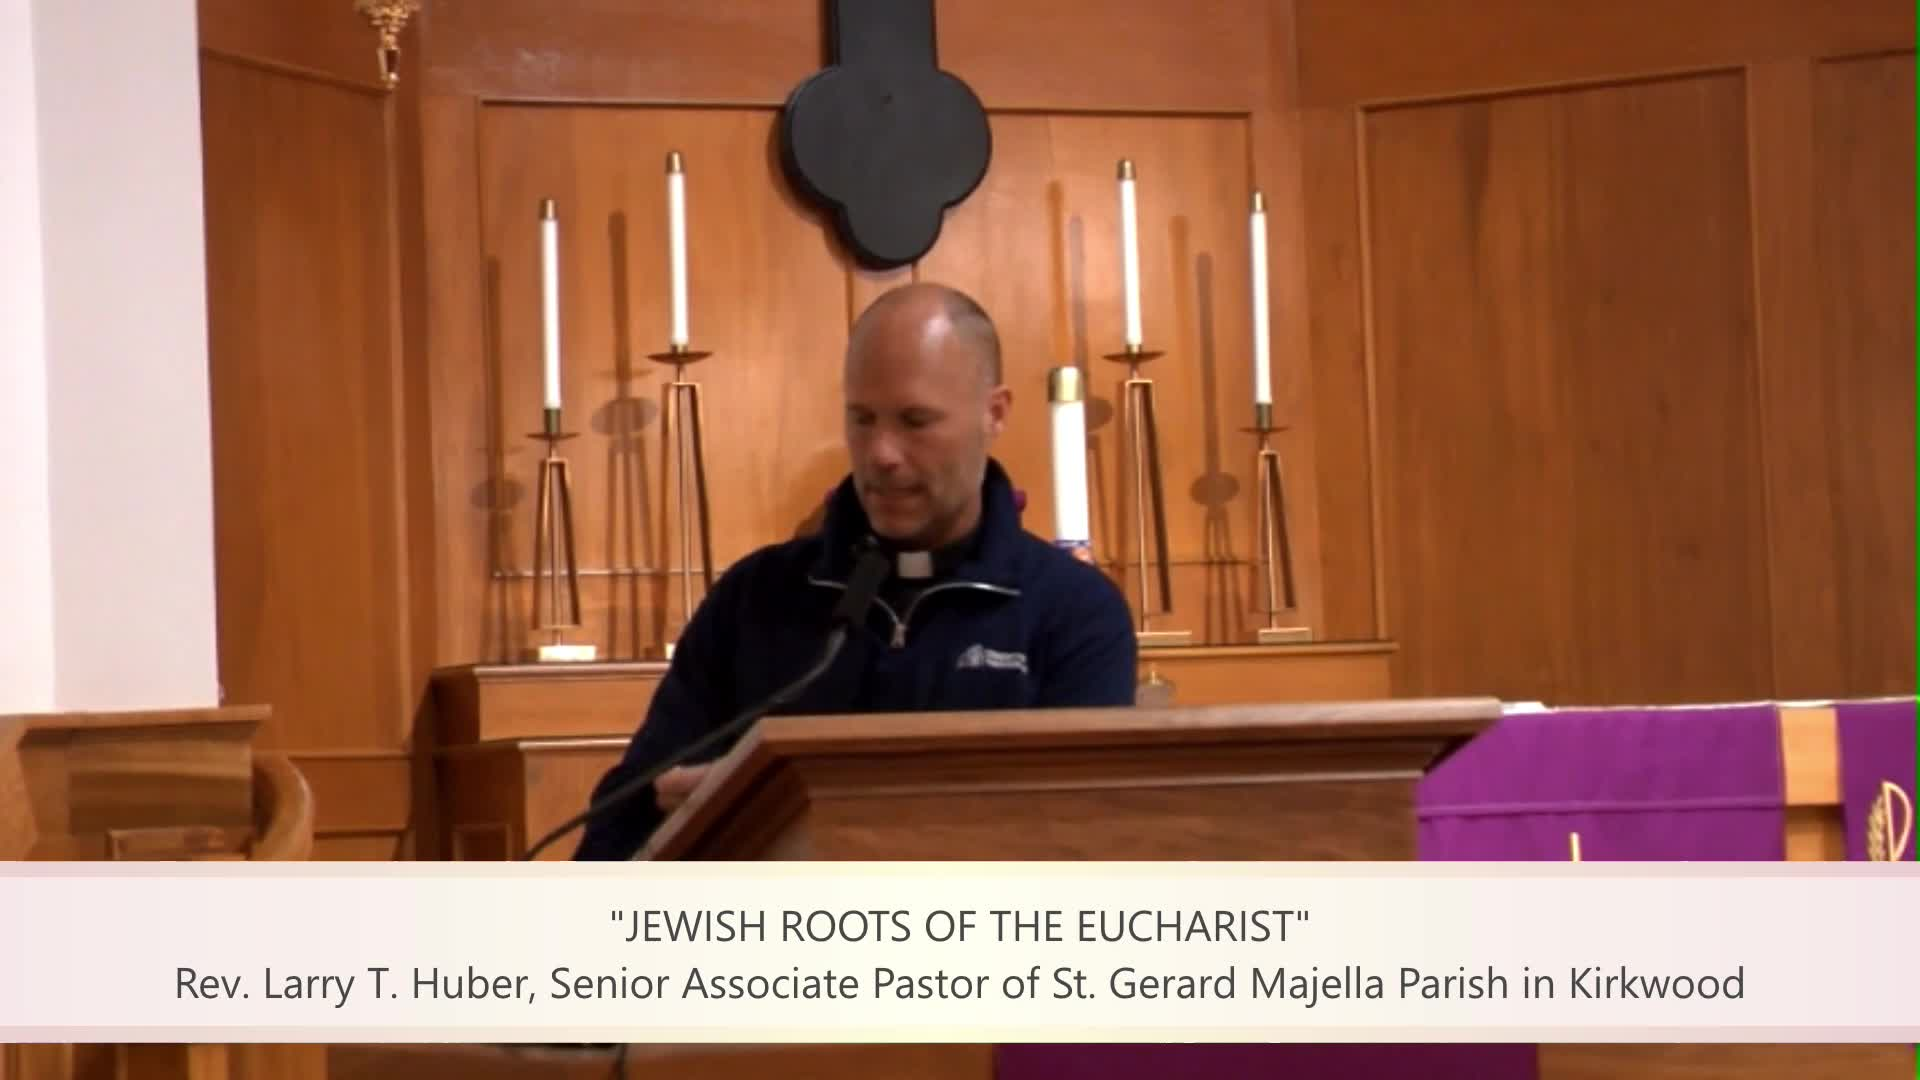 Jewish Roots of the Eucharist